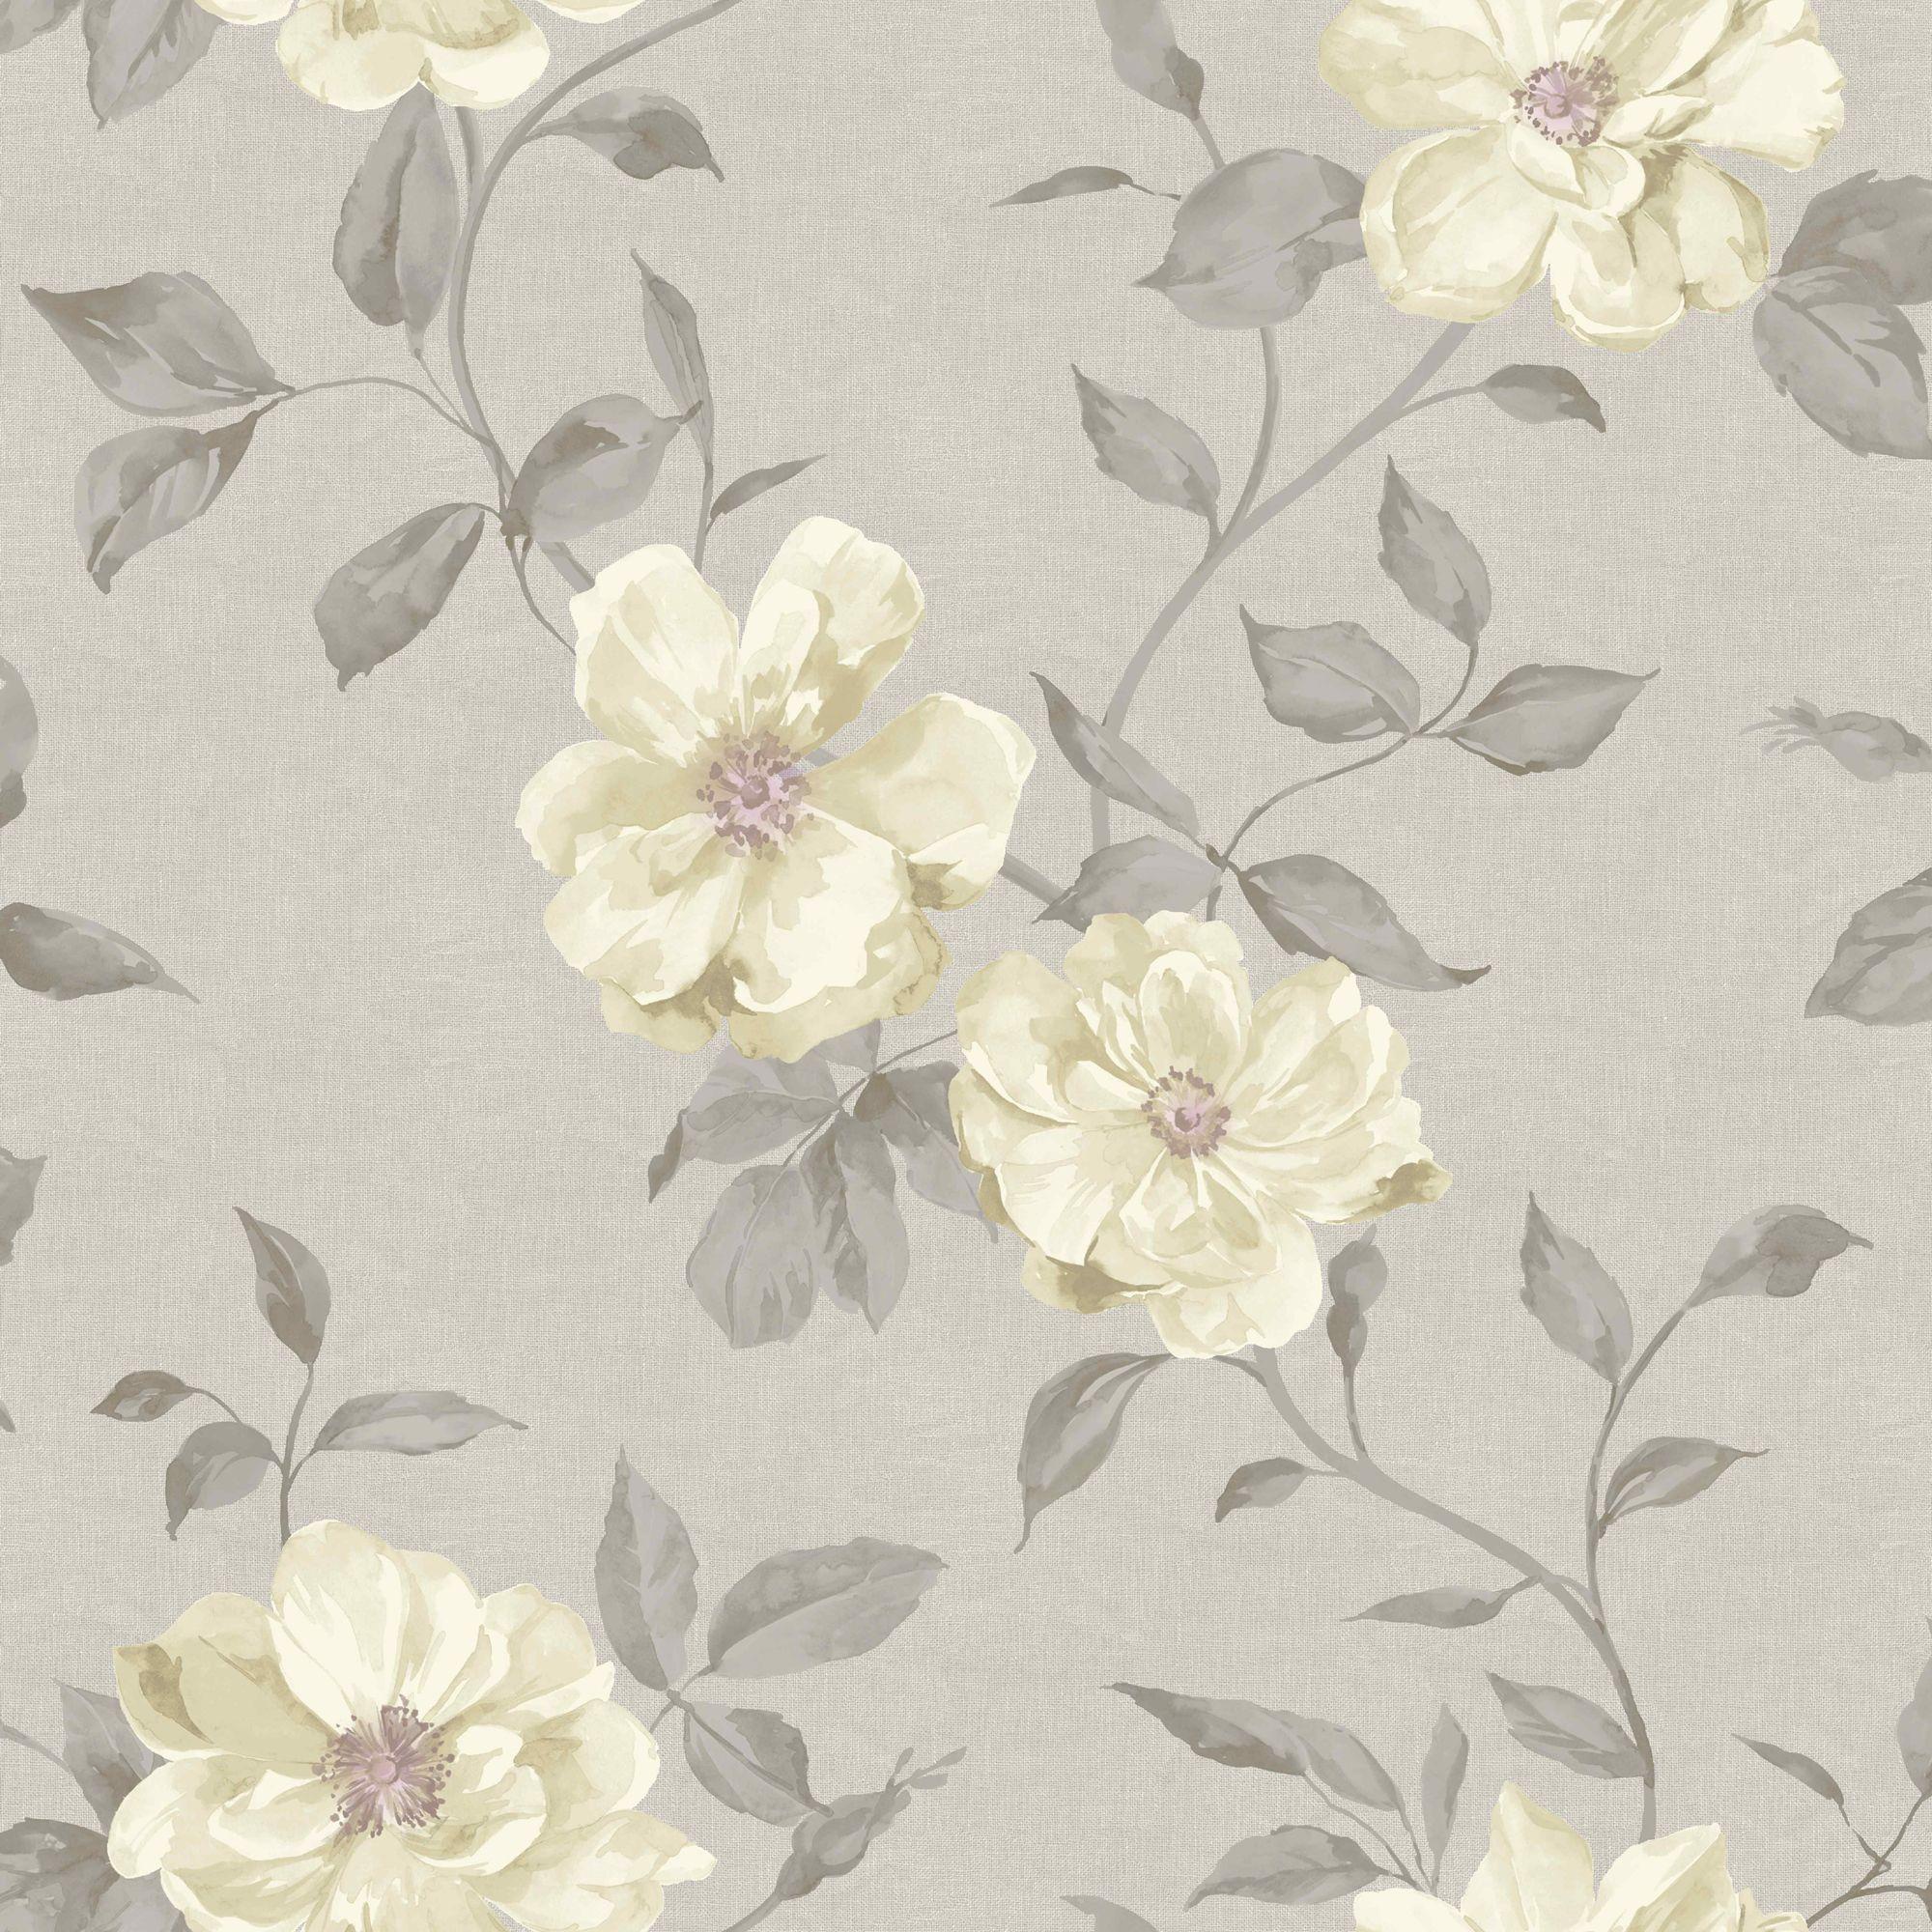 Grandeco Chloe Grey Floral Mica Wallpaper Wallpaper Floral And Grey